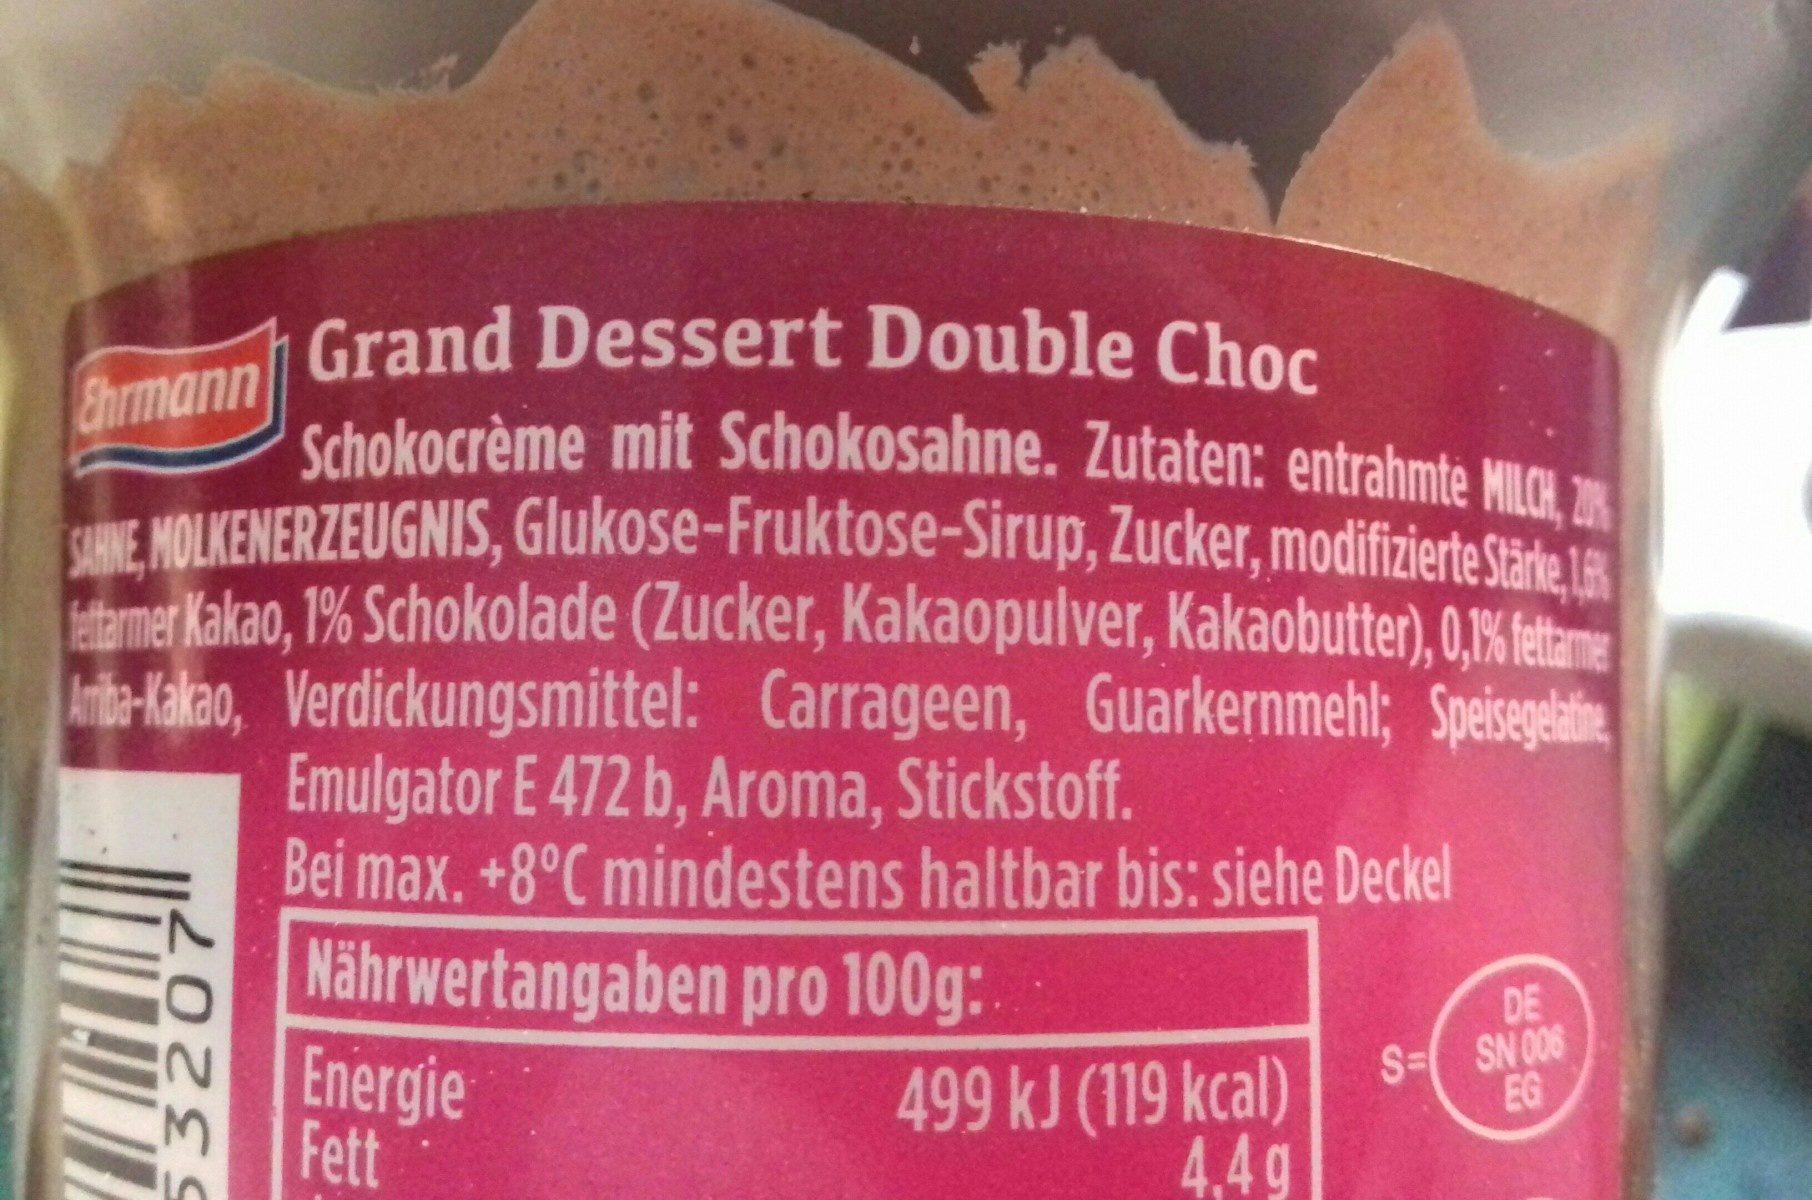 Grand Dessert Double Choc - Ingredients